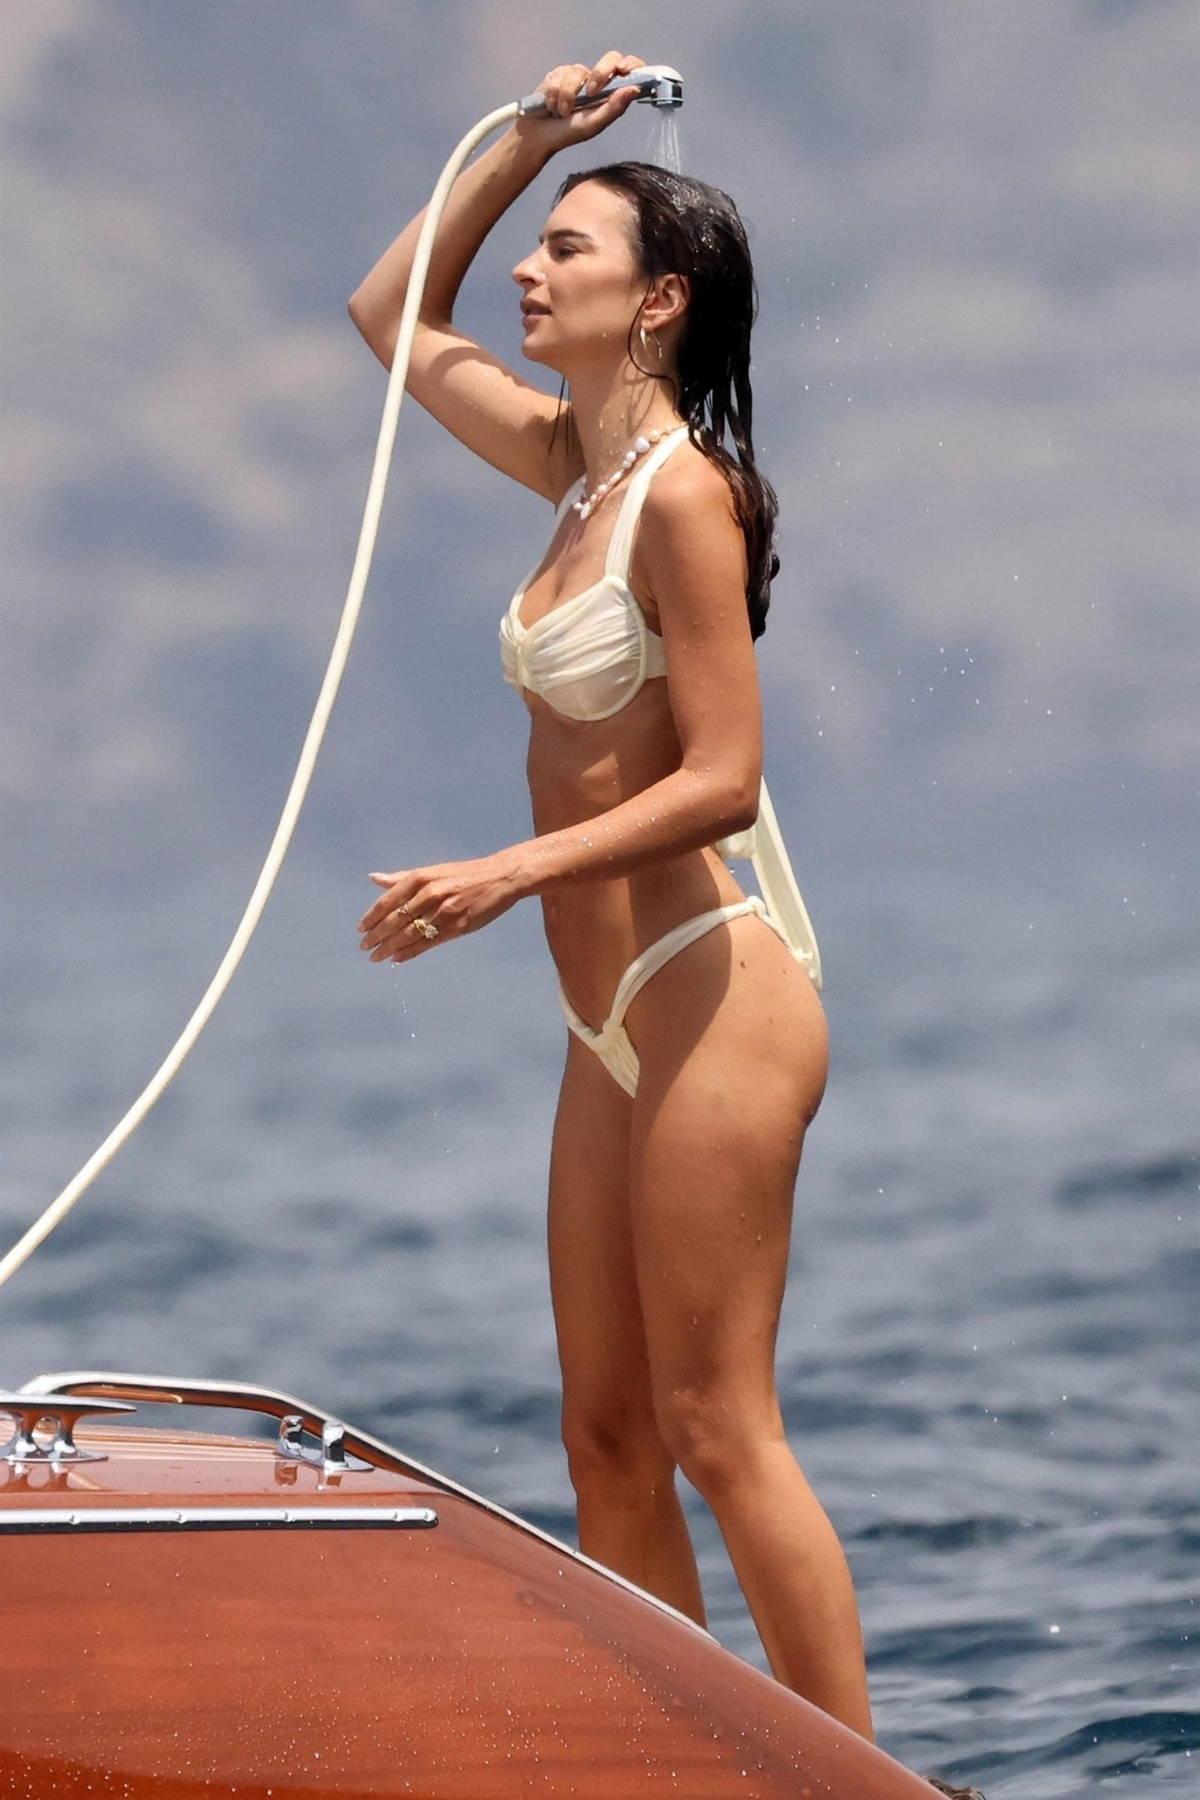 Emily Ratajkowski sizzles in a cream bikini while enjoying a day on a luxury boat her husband on the Amalfi Coast, Italy